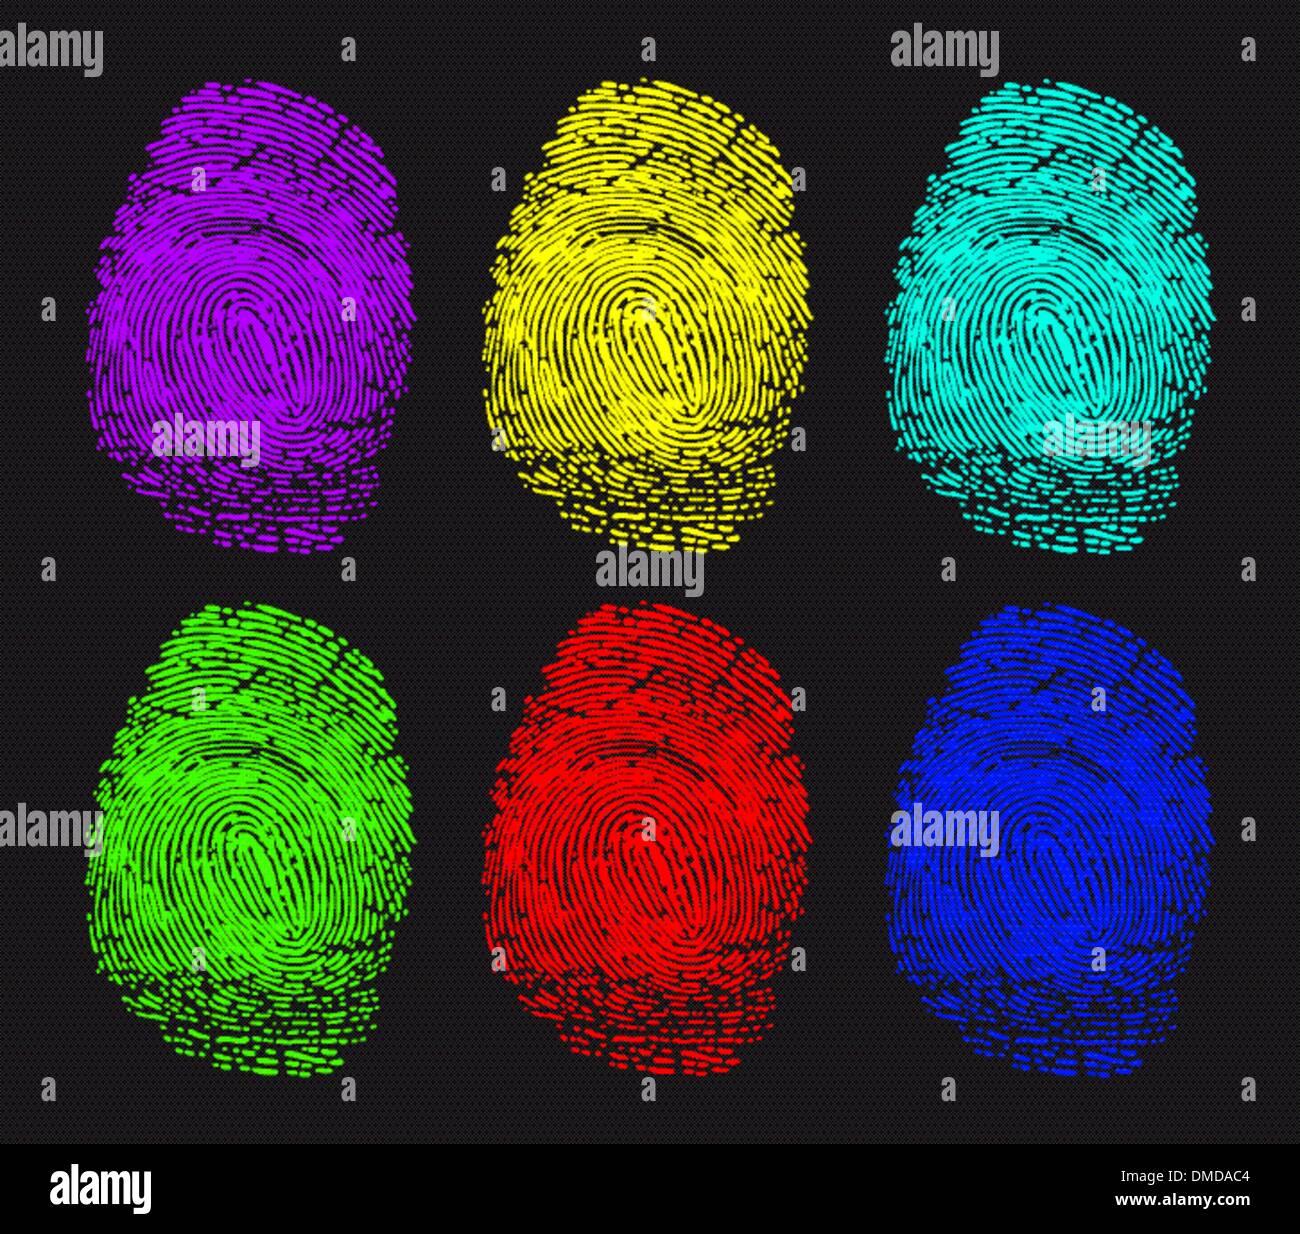 colored fingerprints - Stock Image